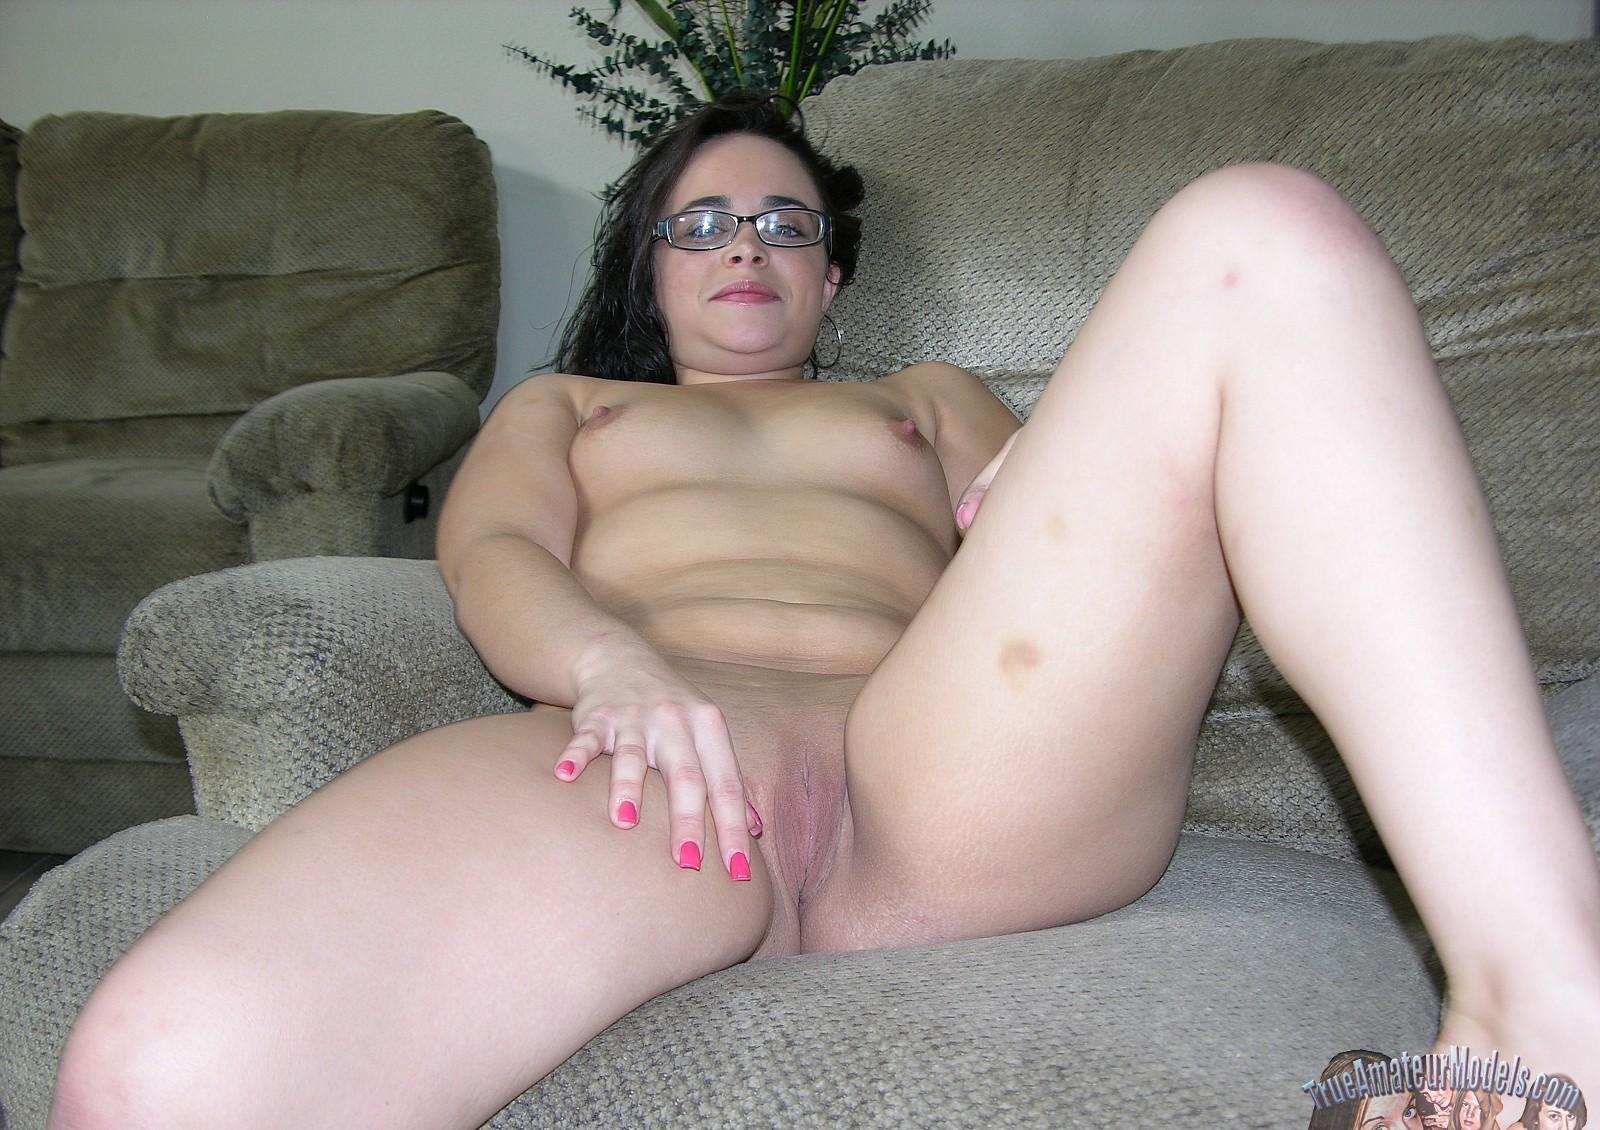 Congratulate, Naked ugly girl videos